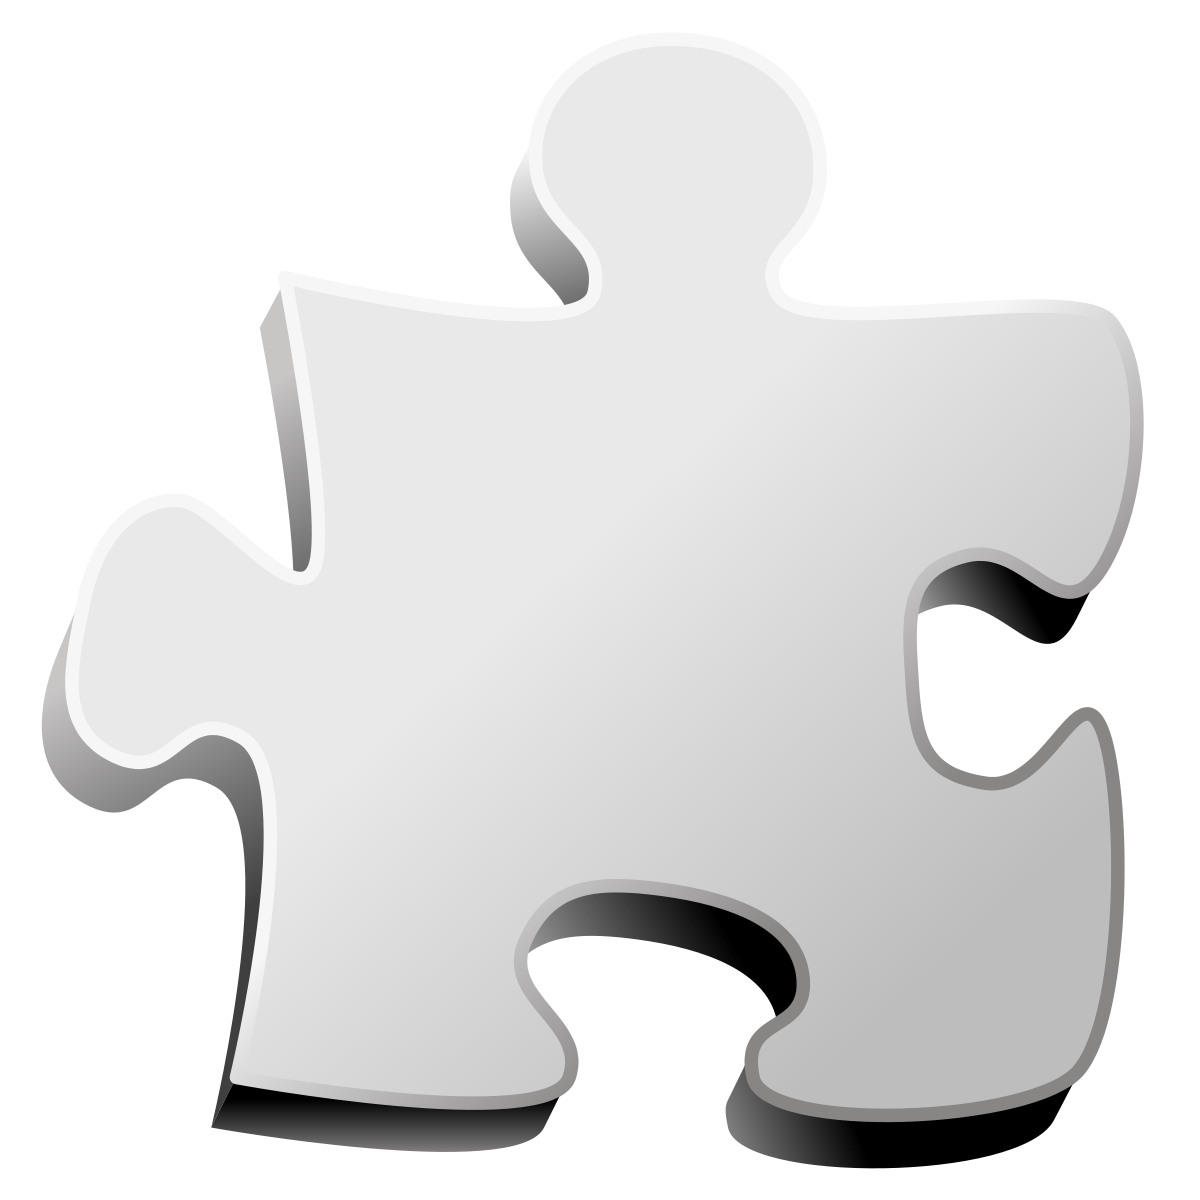 Jigsaw Puzzles Puzz 3D Lock puzzle Clip art.